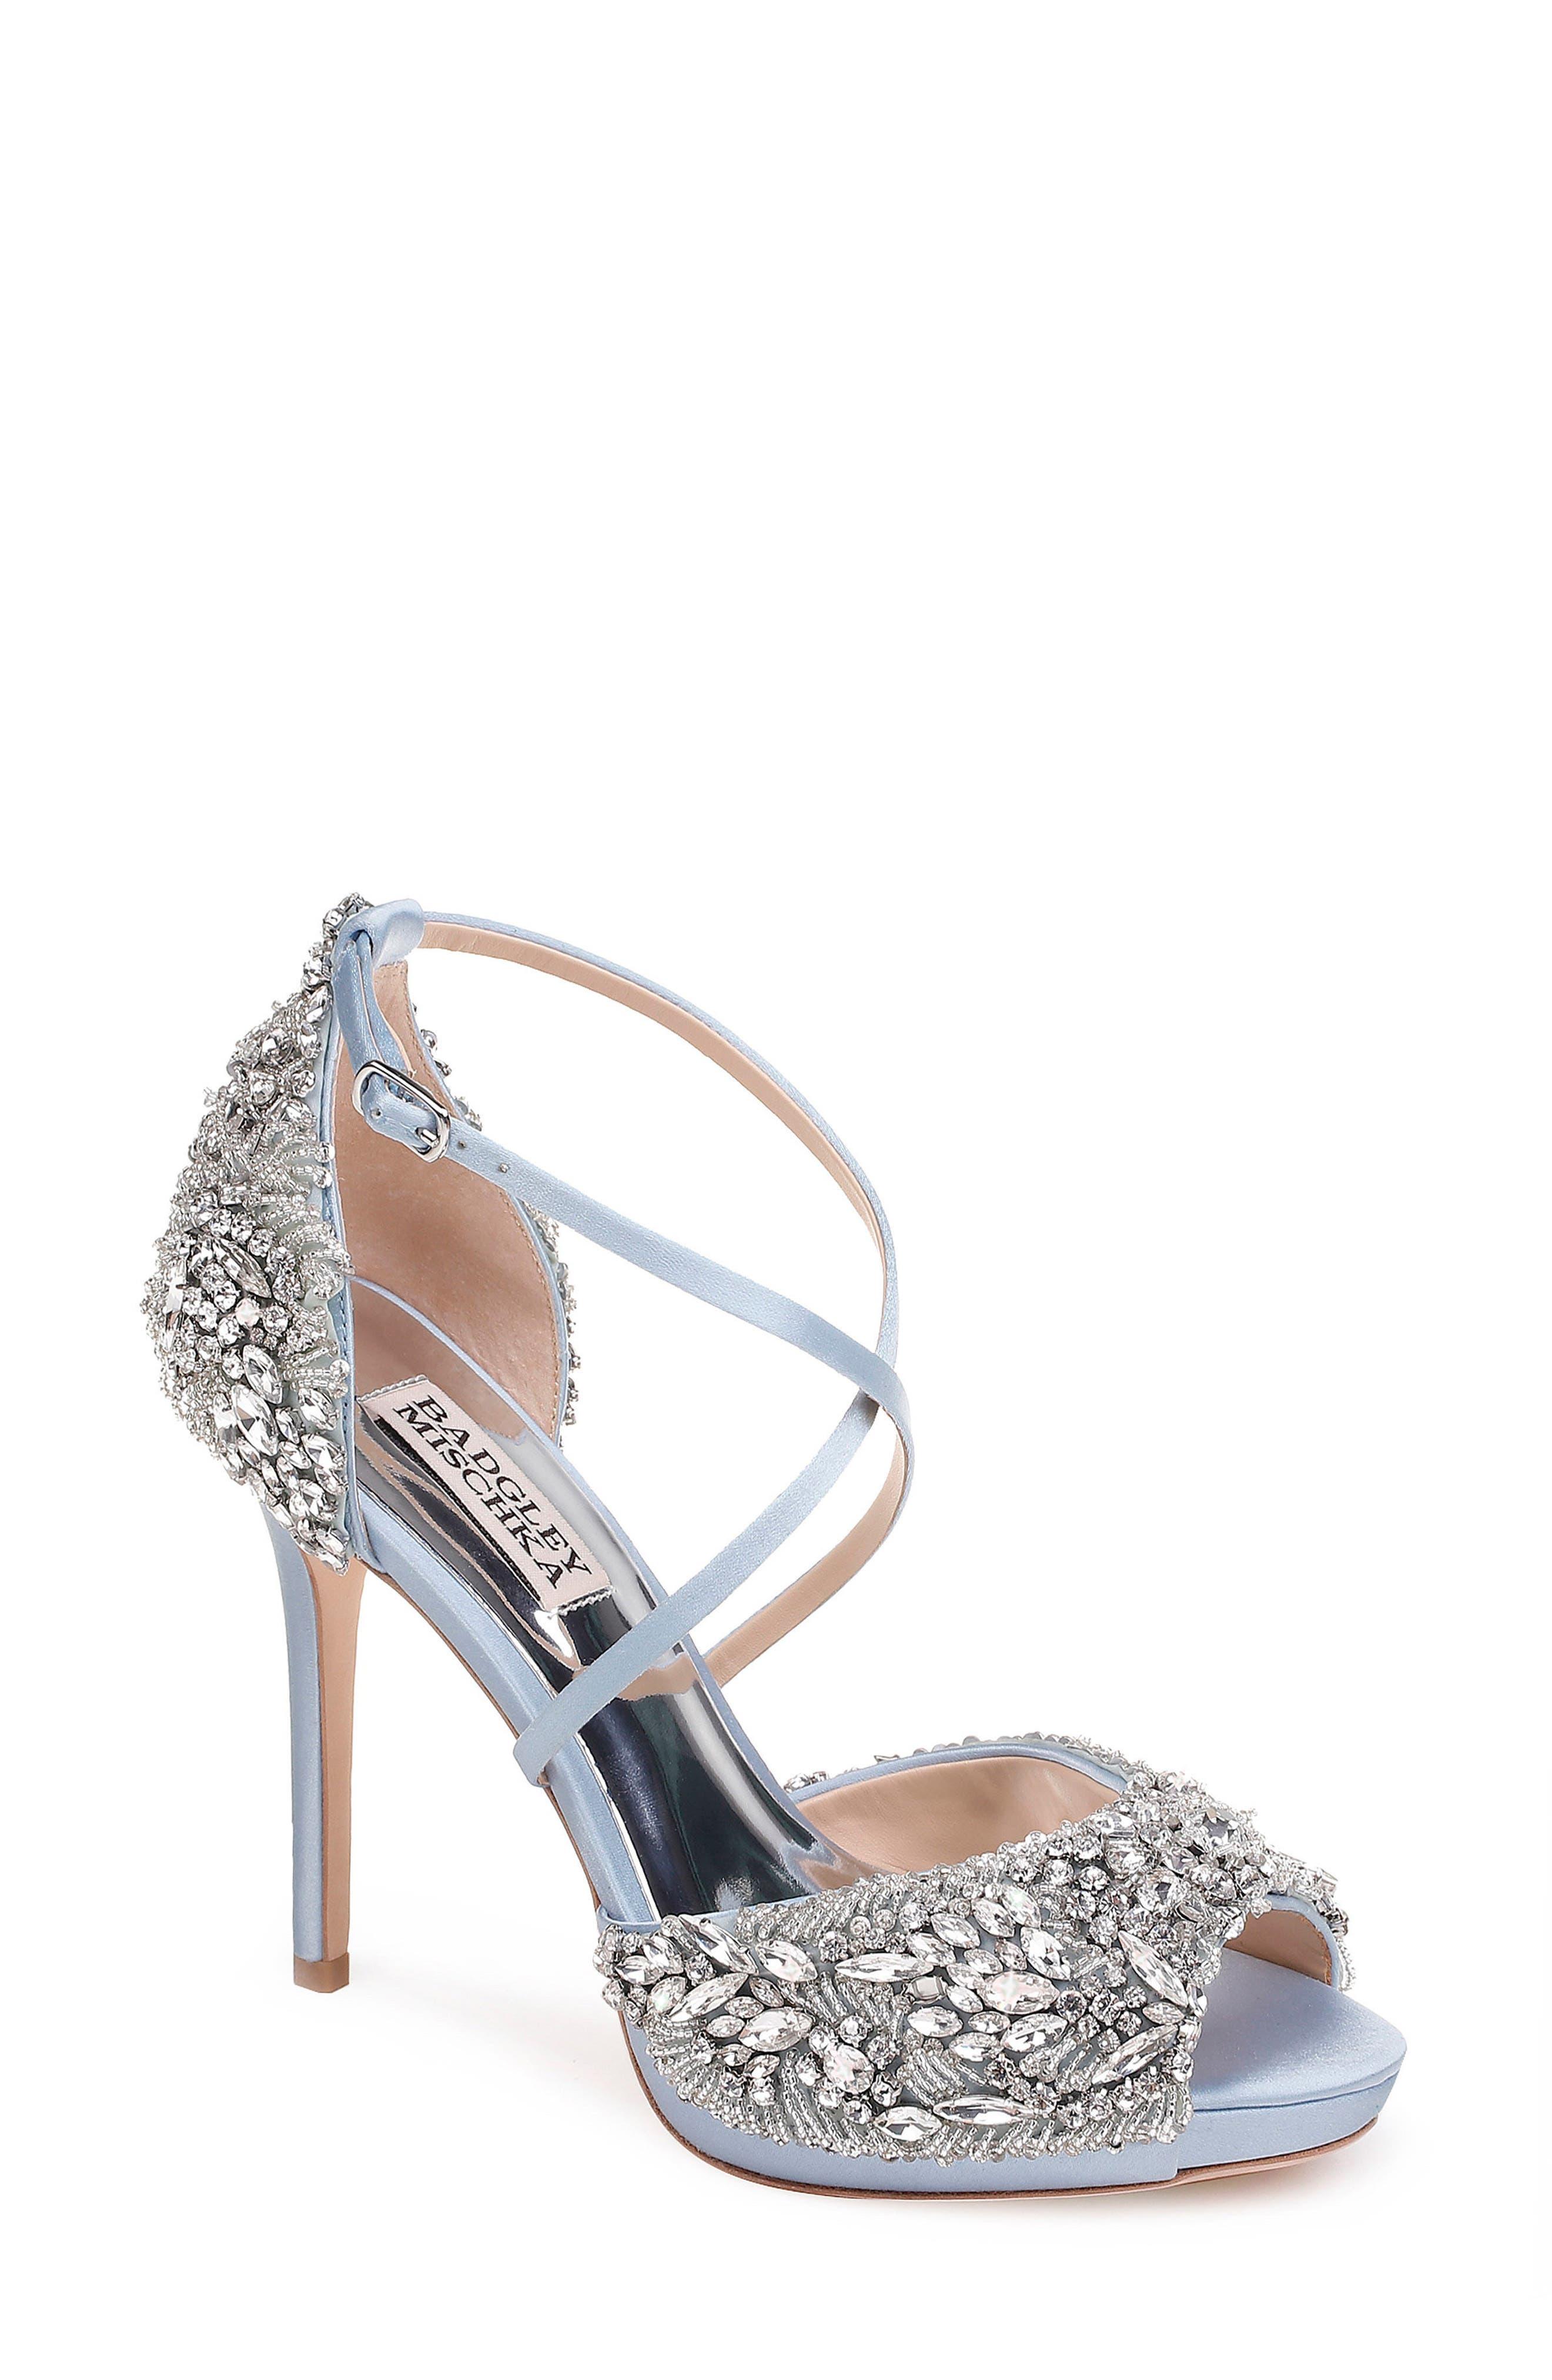 Main Image - Badgley Mischka Hyper Crystal Embellished Sandal (Women)